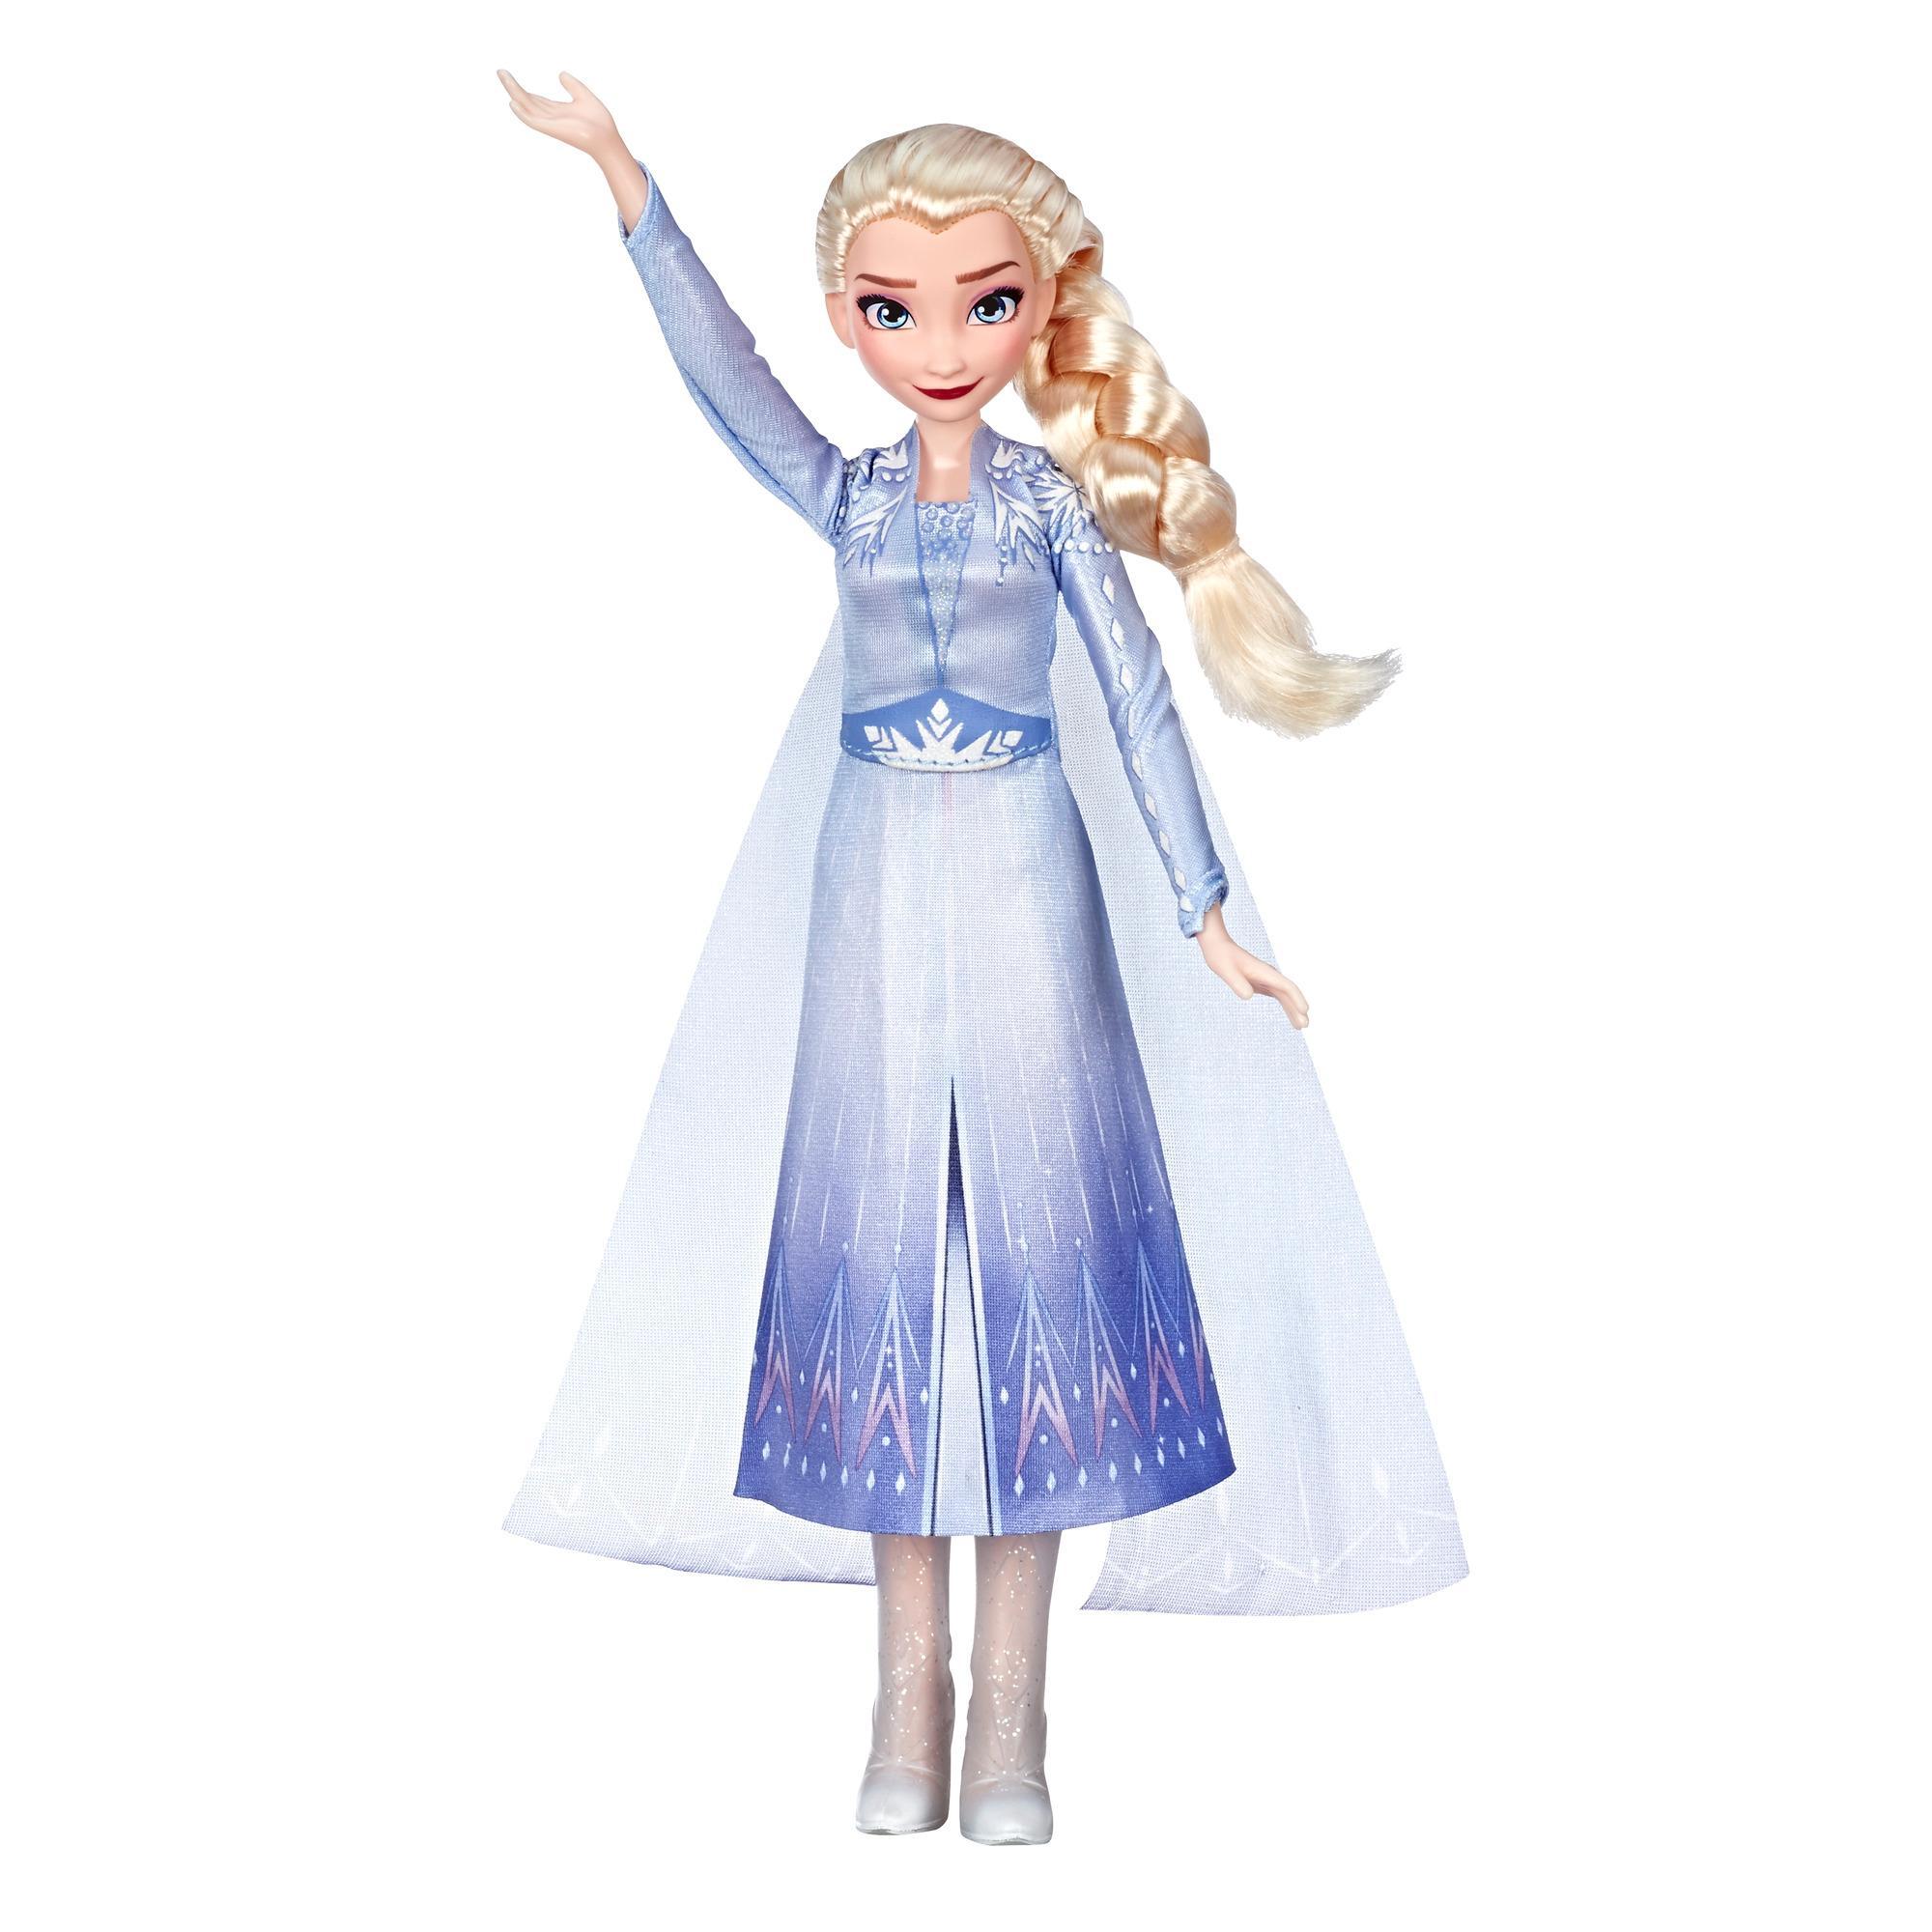 Disney Frozen Singing Elsa Fashion Doll with Music Wearing Blue Dress Inspired by Disney Frozen 2